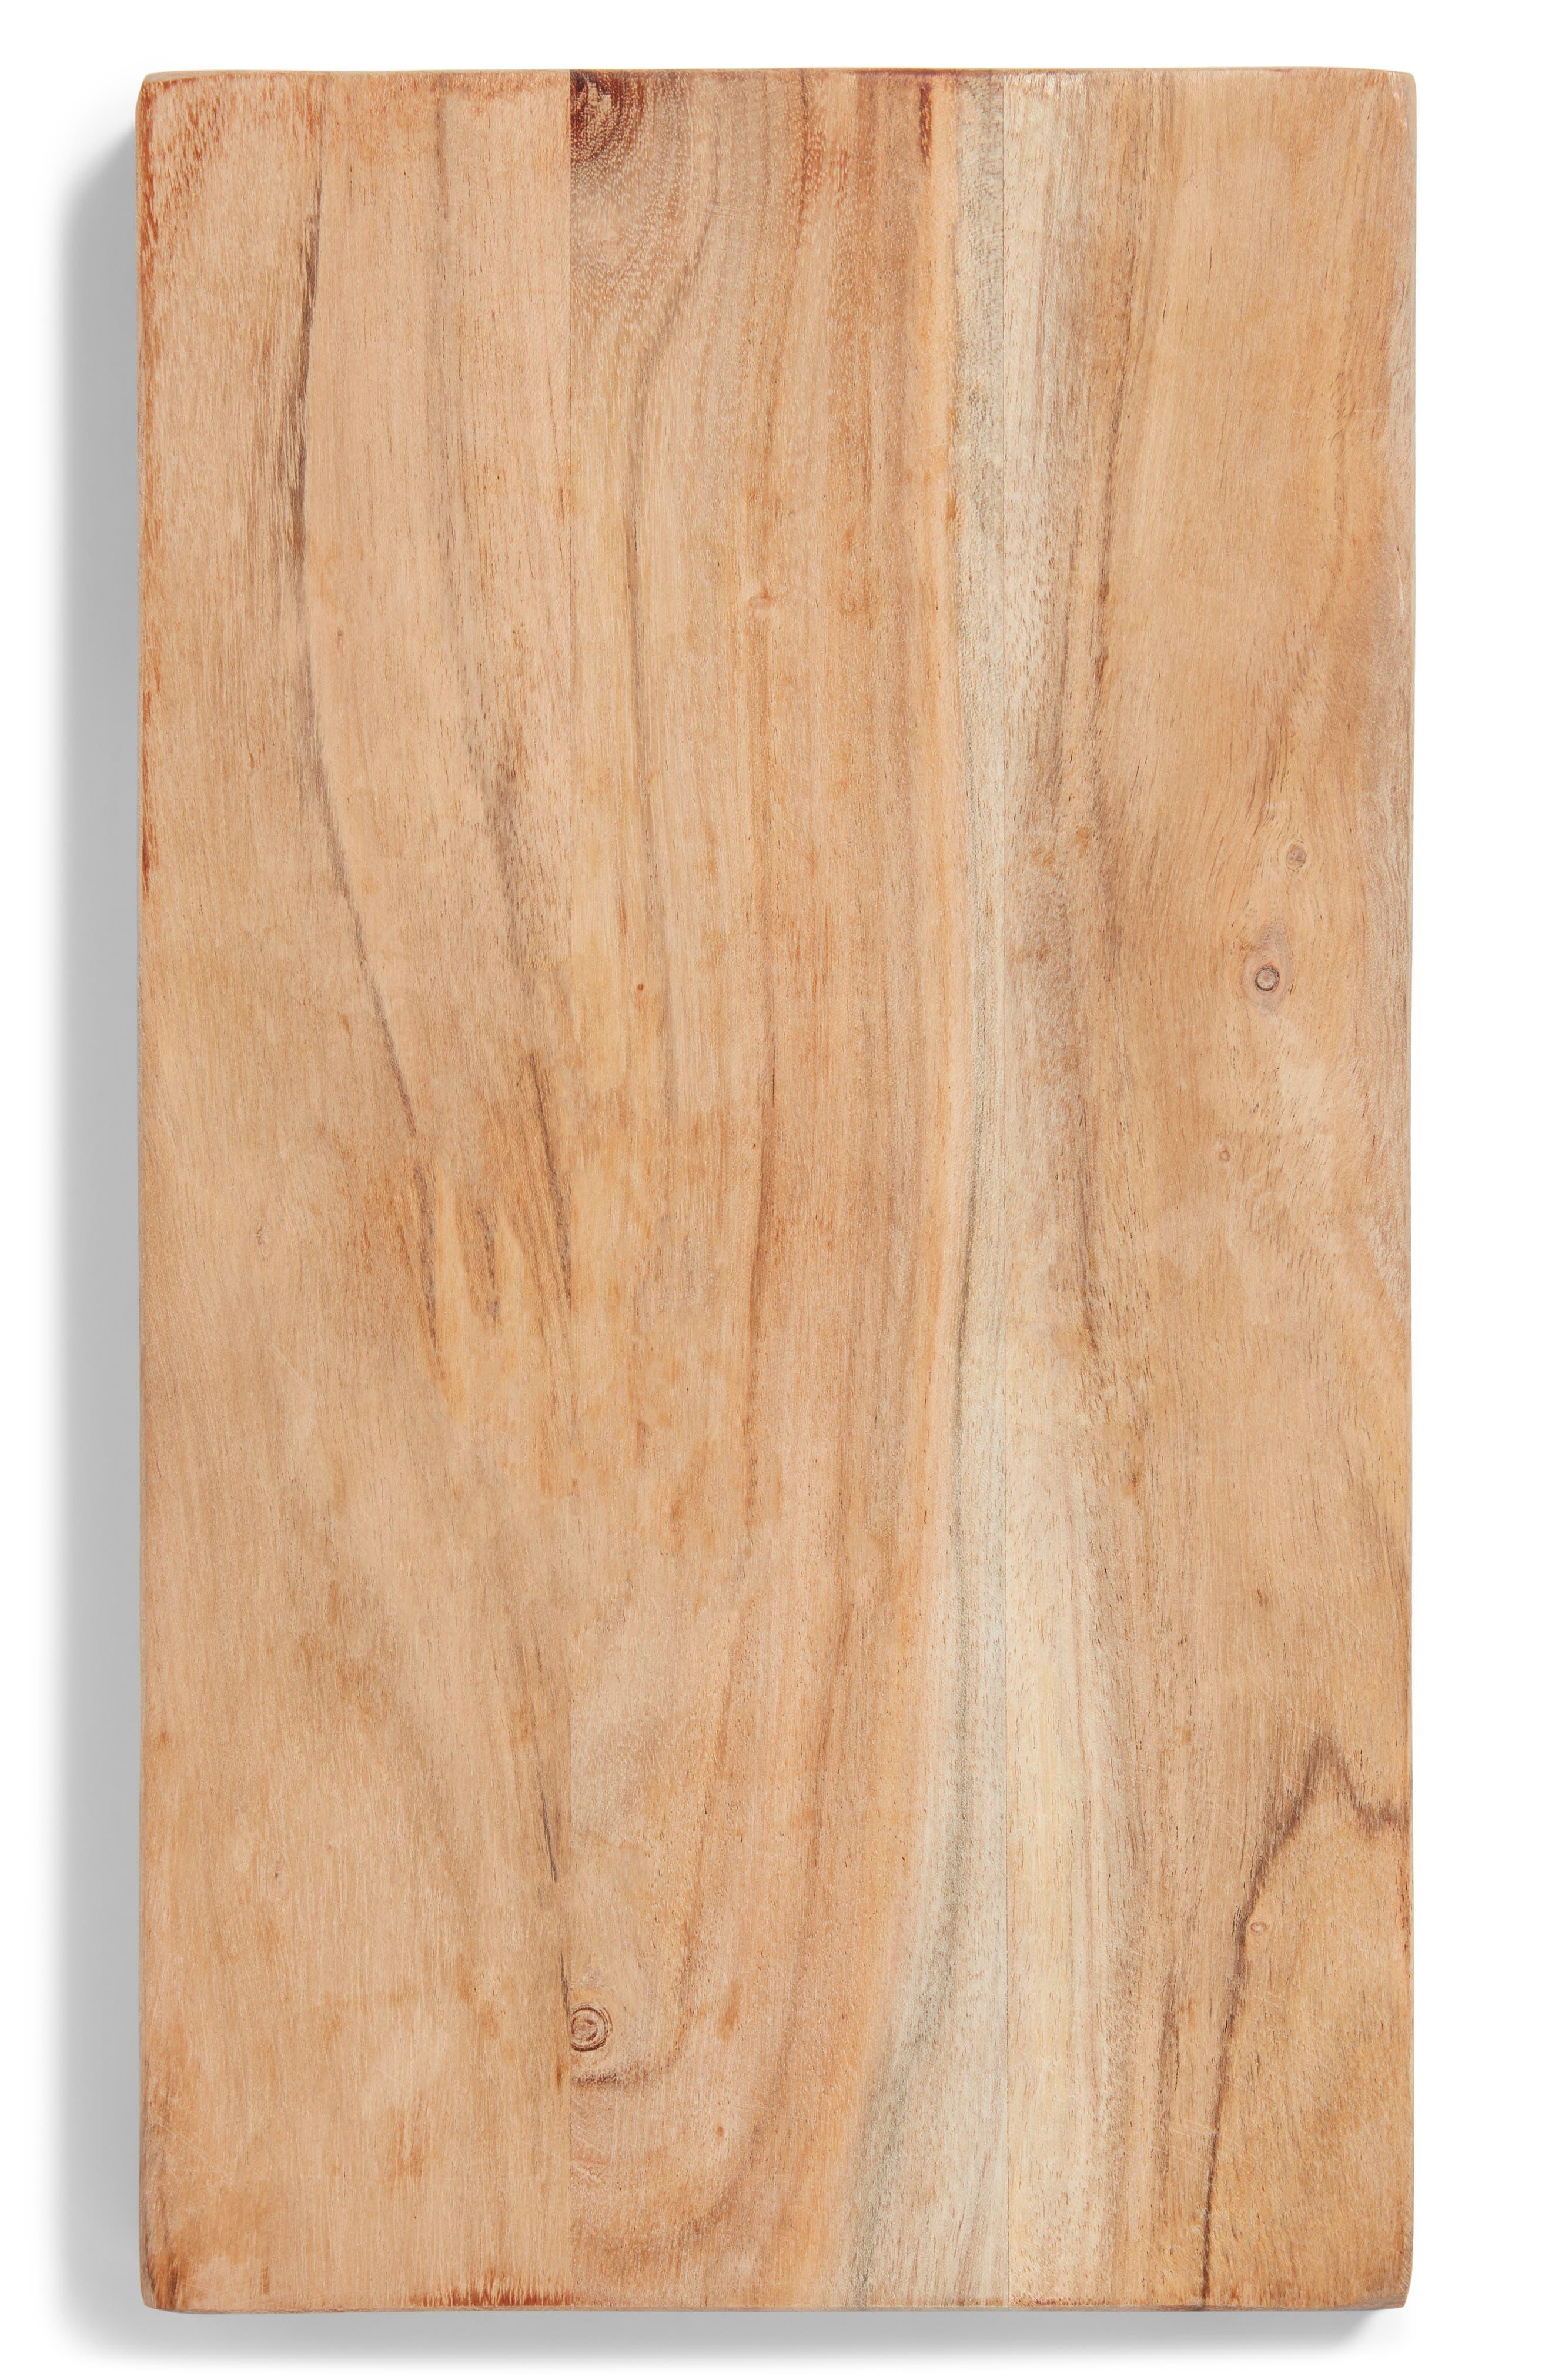 Blue Marble & Mango Wood Reversible Serving Board,                             Alternate thumbnail 3, color,                             Wood